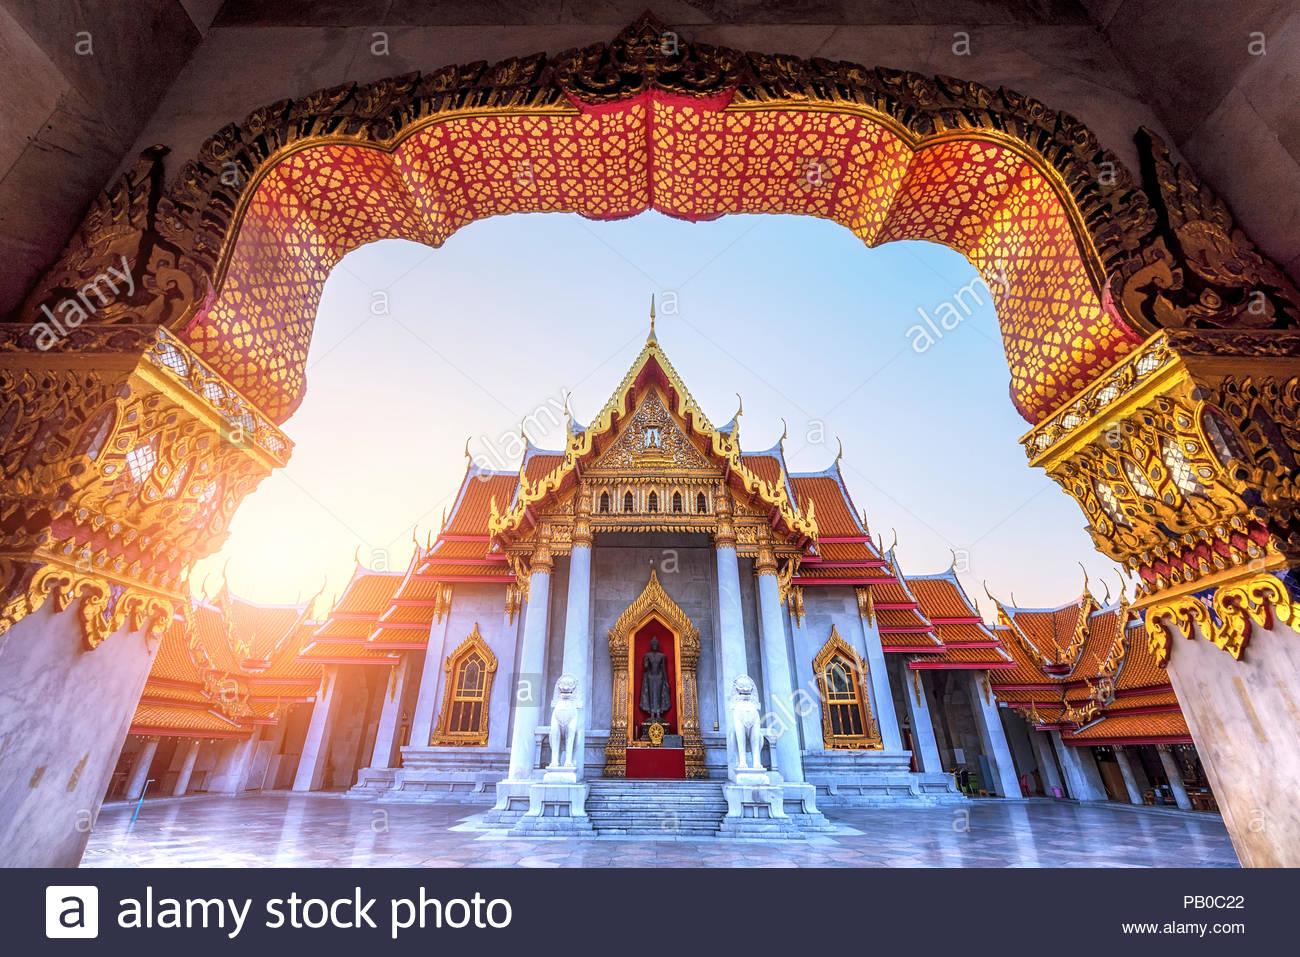 Thai Temple, Wat Benchamabophit Bangkok Thailand. - Stock Image